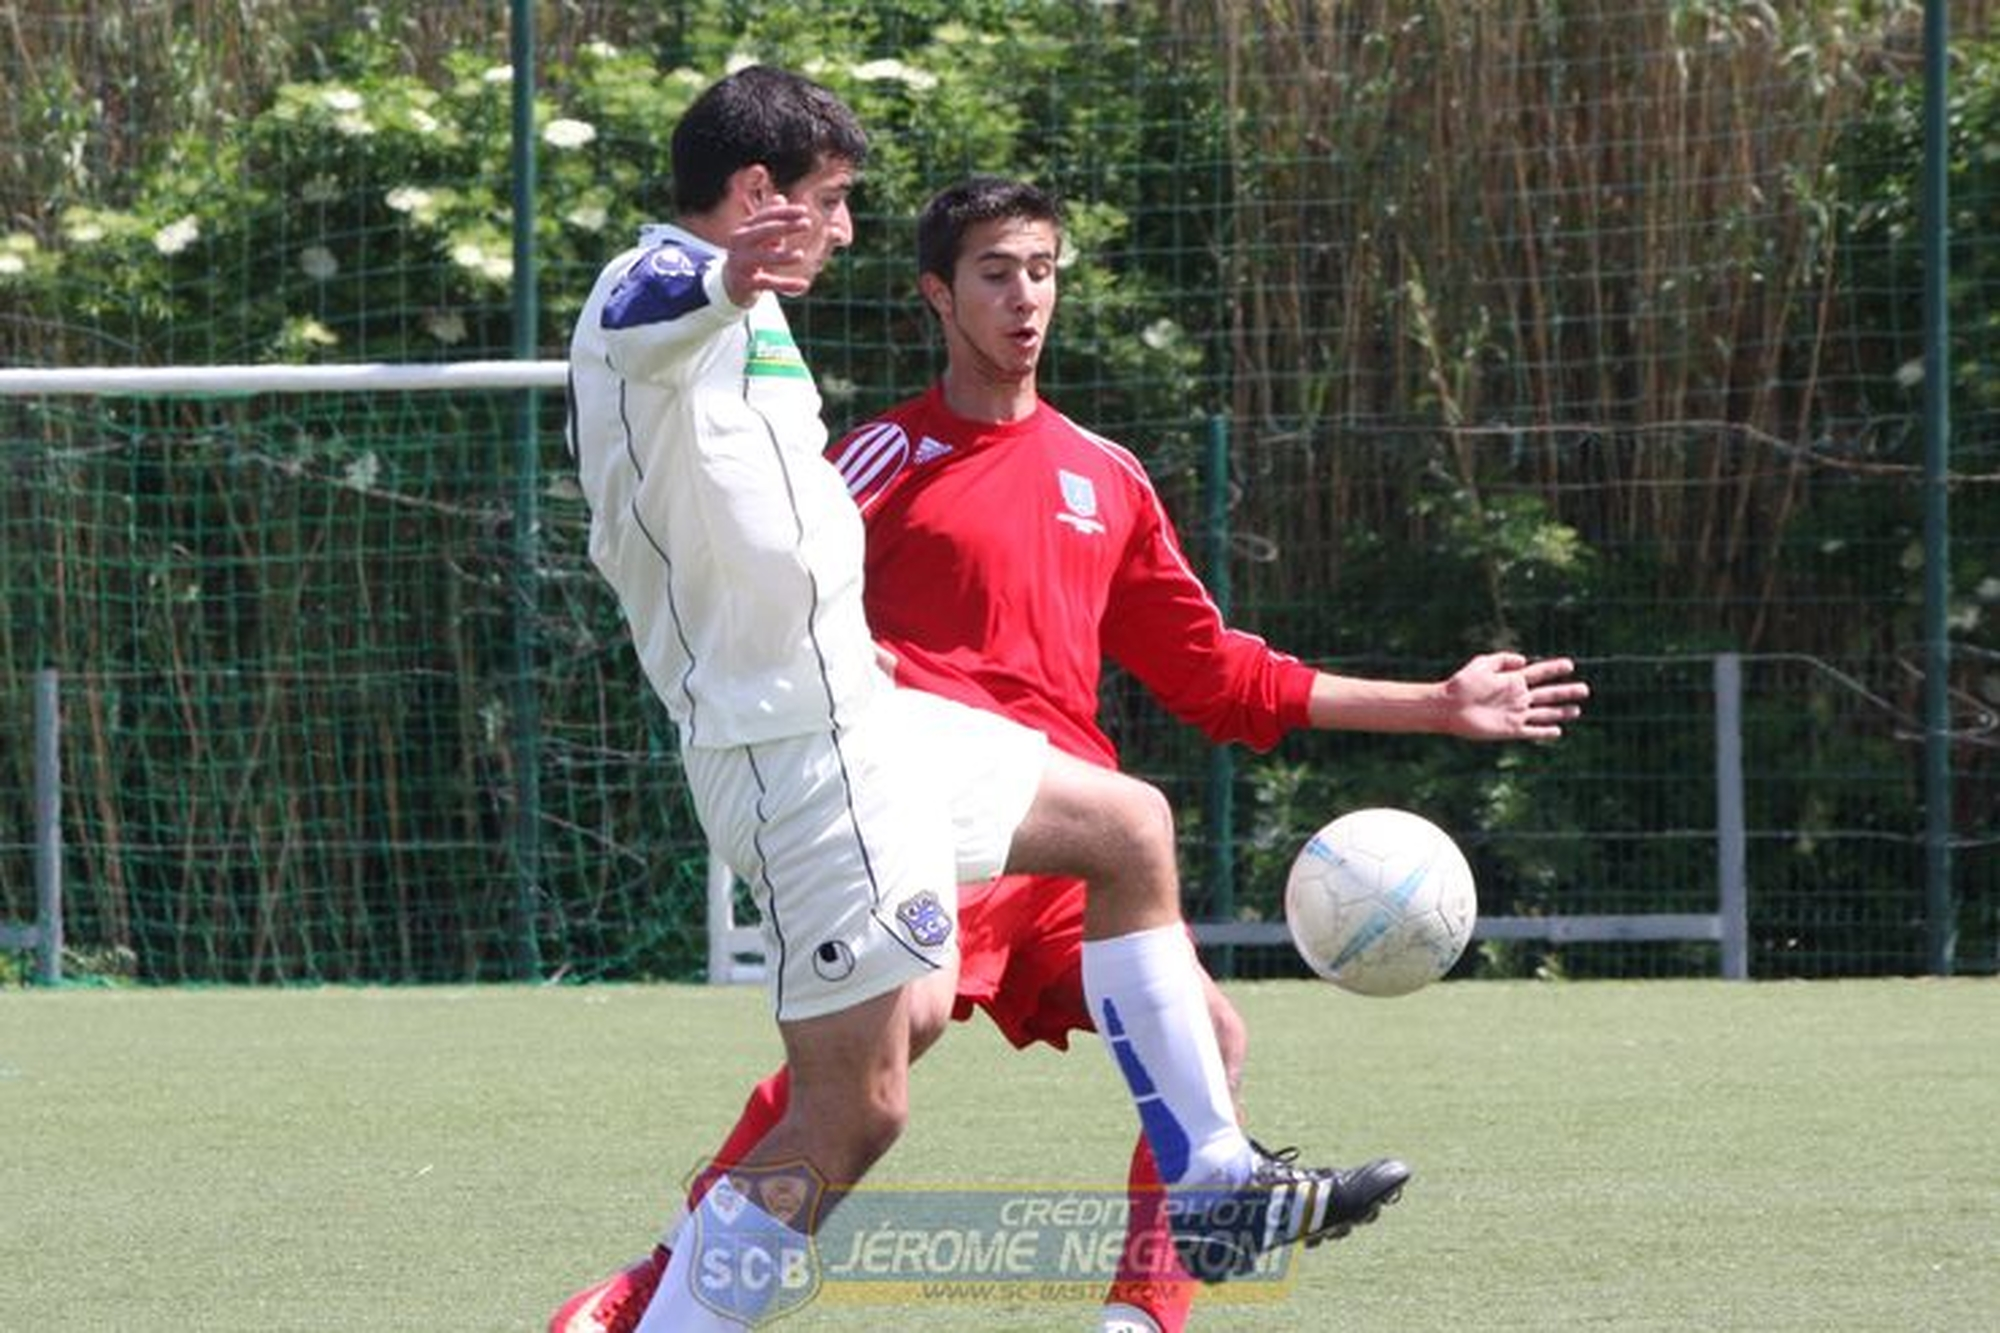 PERPIGNAN/SCB (16 ans Nationaux)